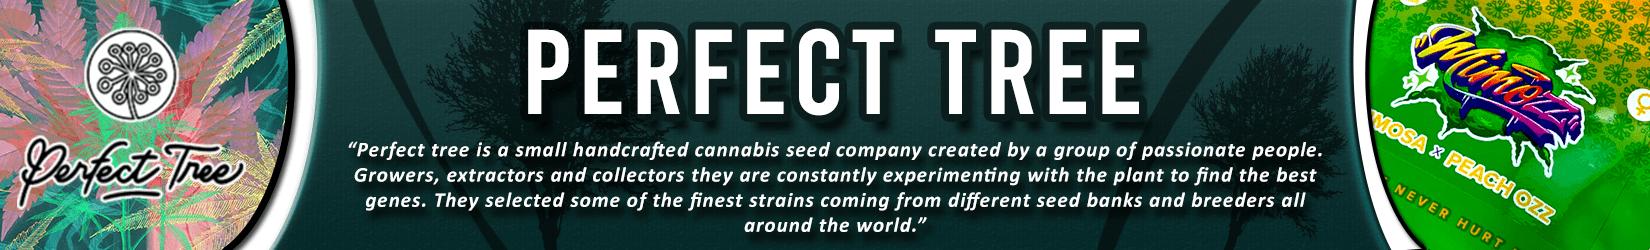 Cannabis Seeds Breeder - Perfect Tree